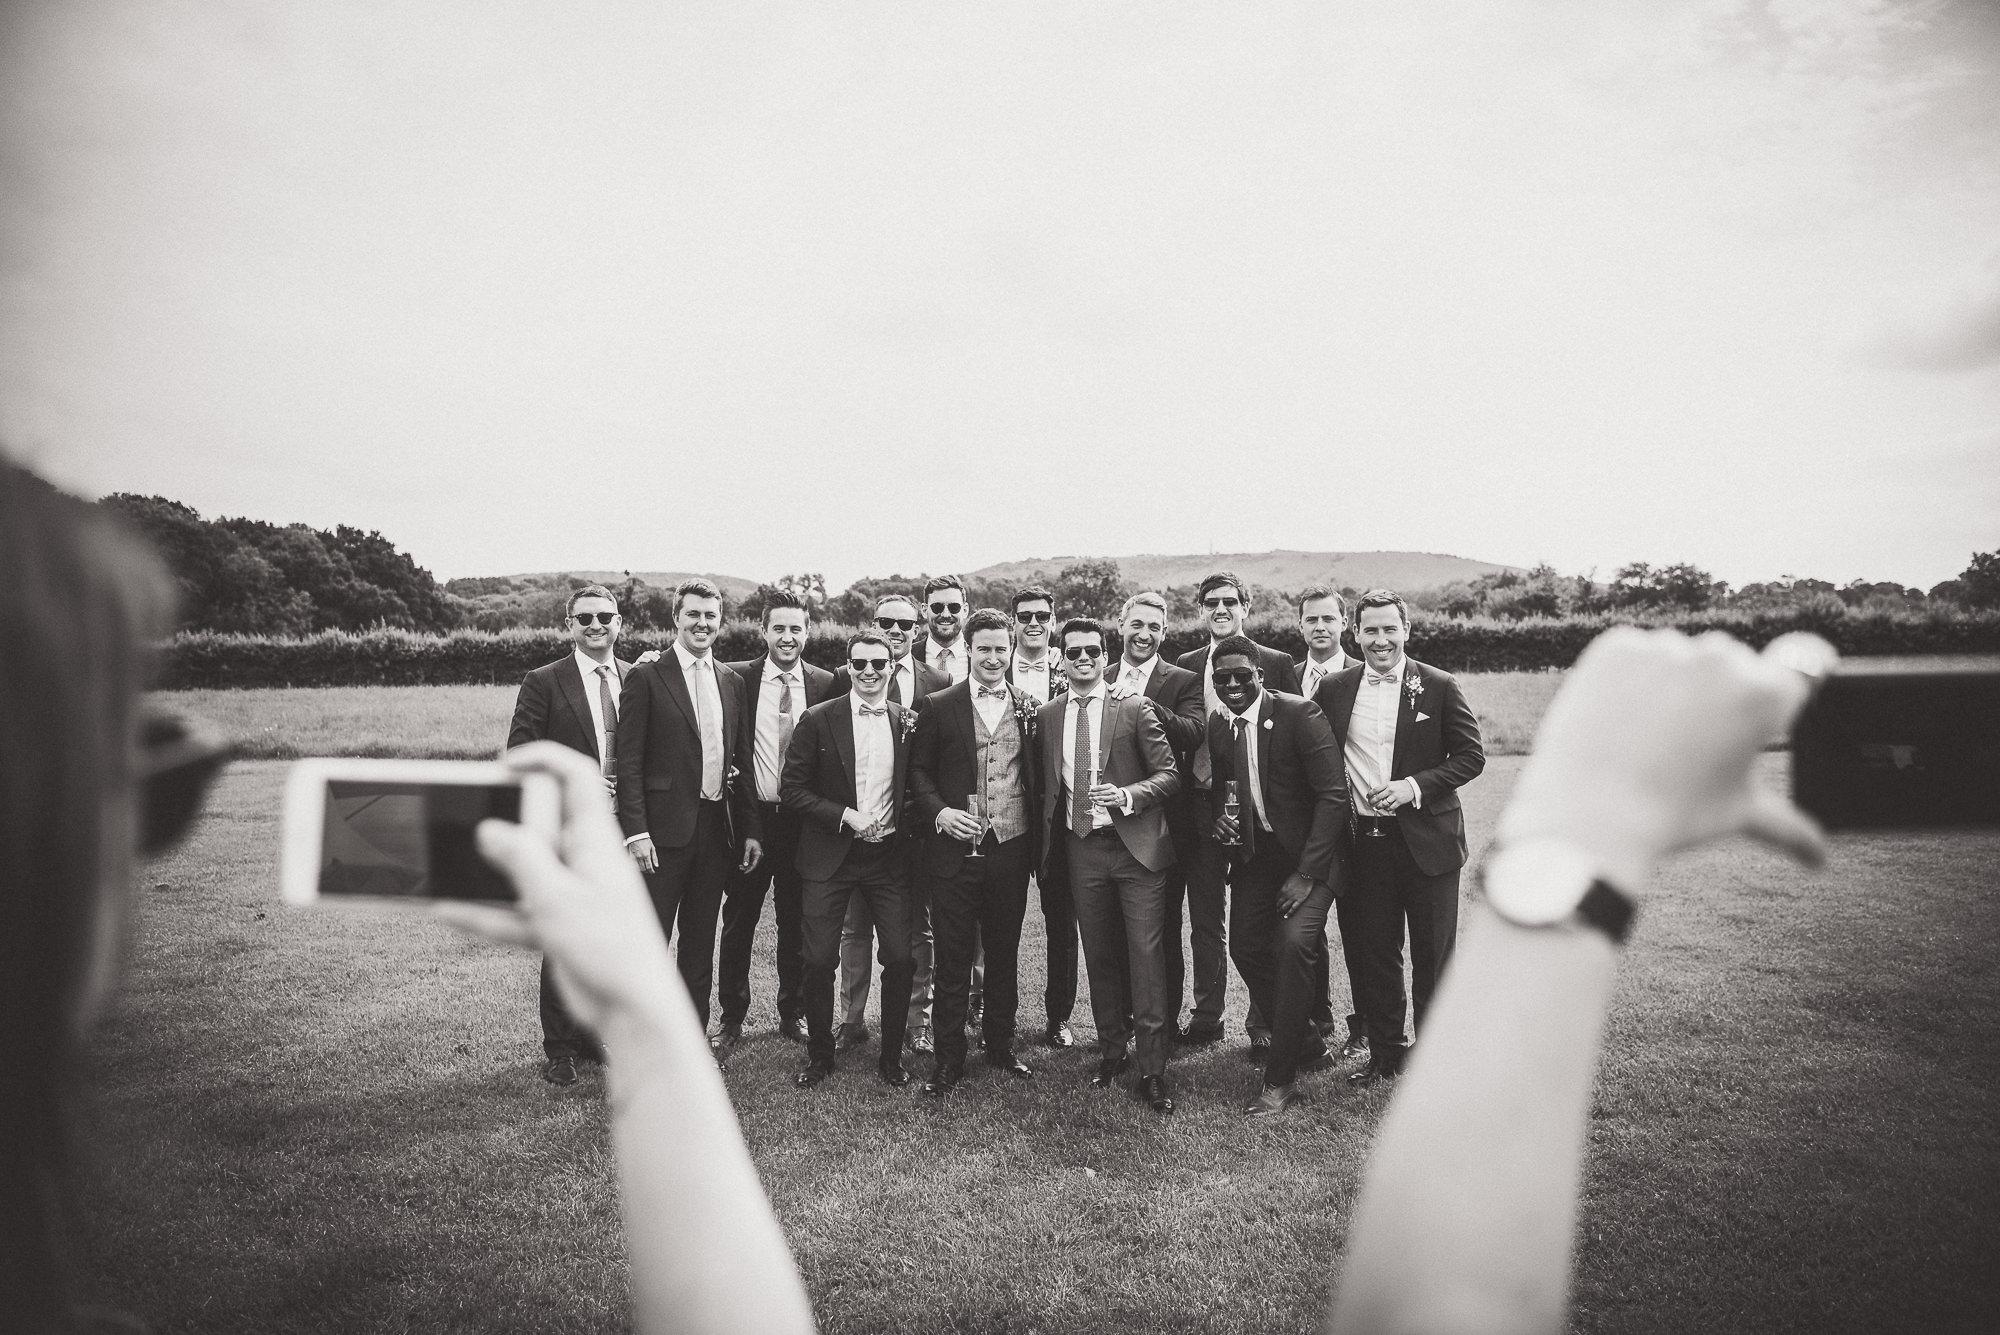 Veils & Bales Wedding Photography | Charlie & Steve SCSS 113